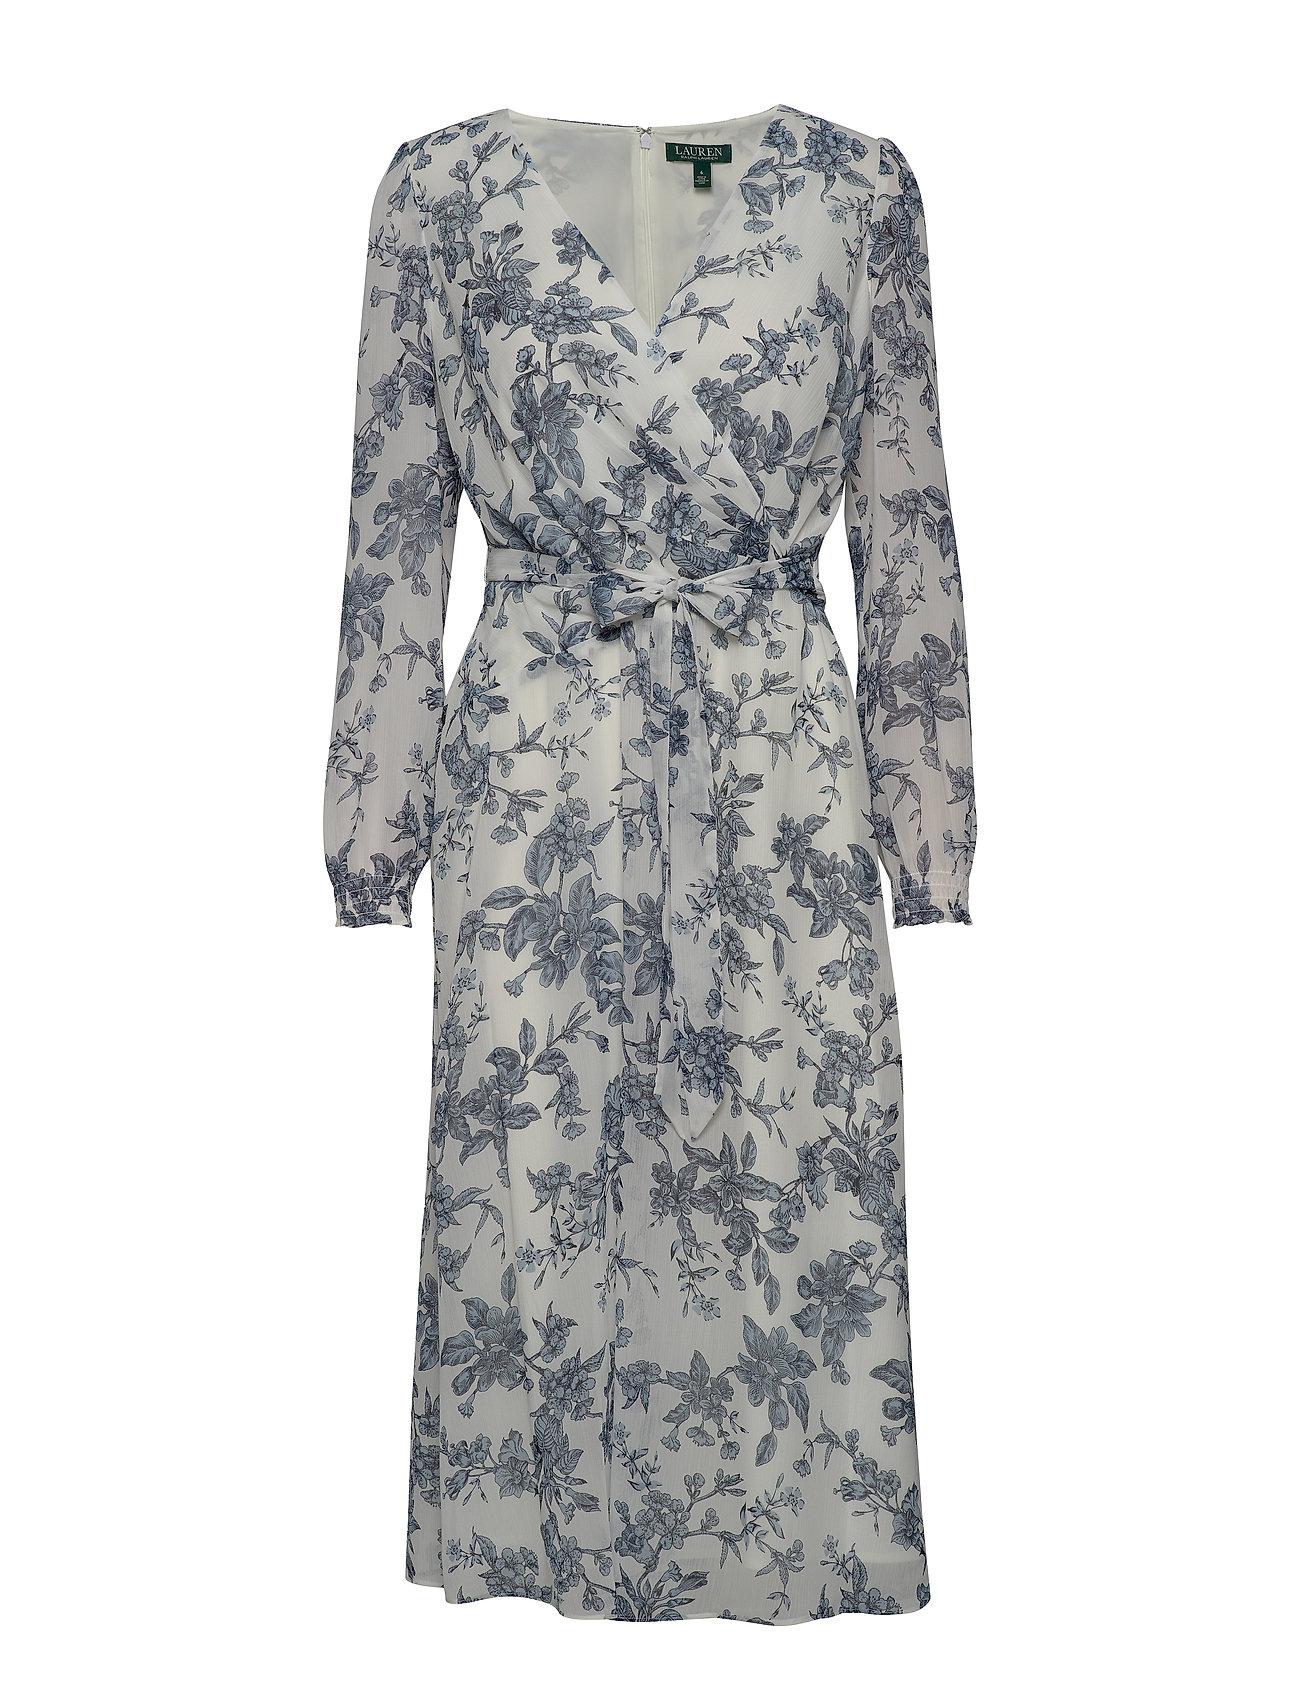 Lauren Ralph Lauren PRINTED GEORGETTE-DRESS - COLONIAL CREAM/BL